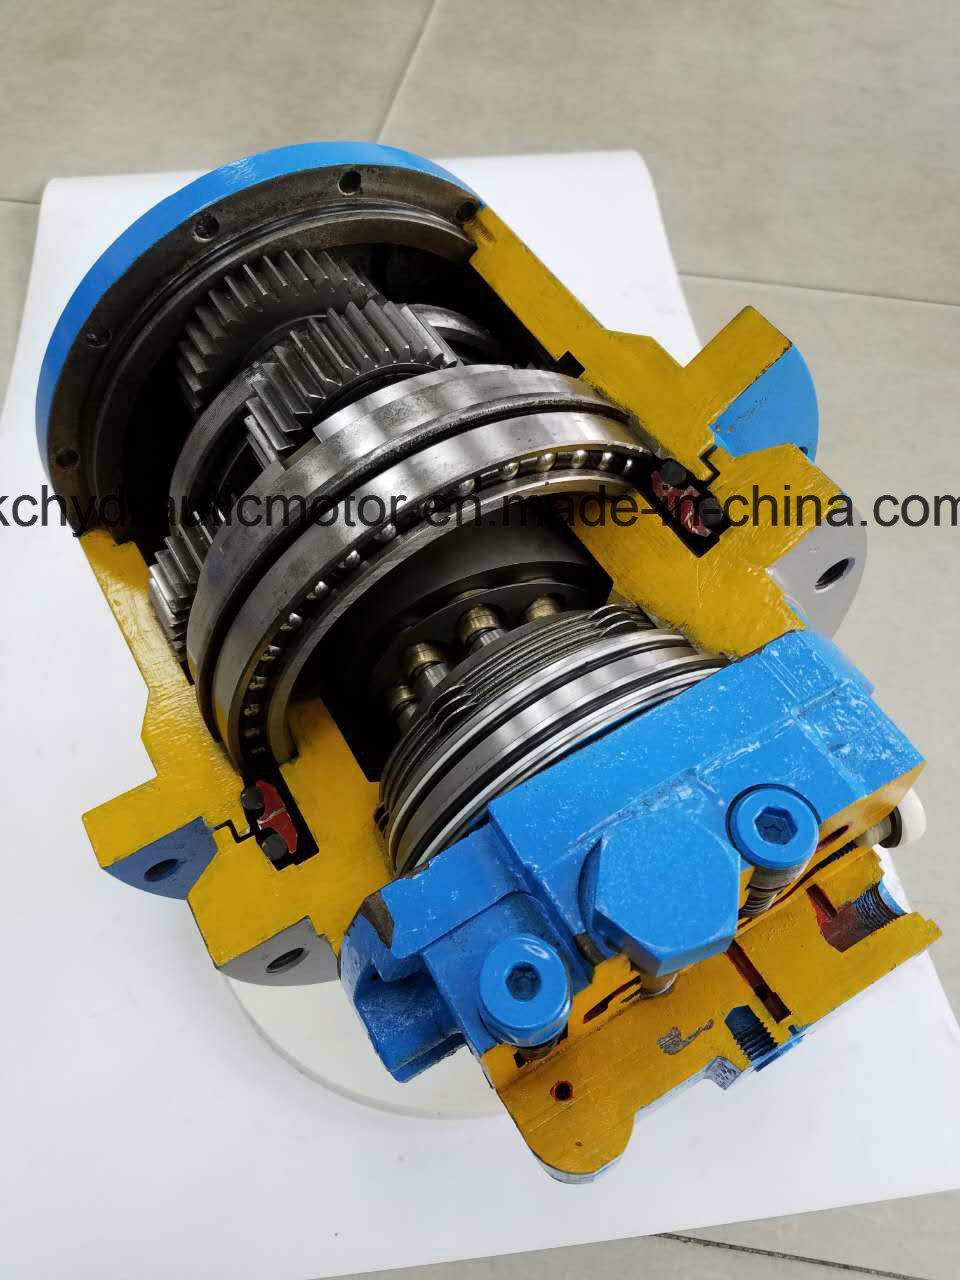 Excavator Spare Parts for 12t~16t Caterpillar Crawler Machinery